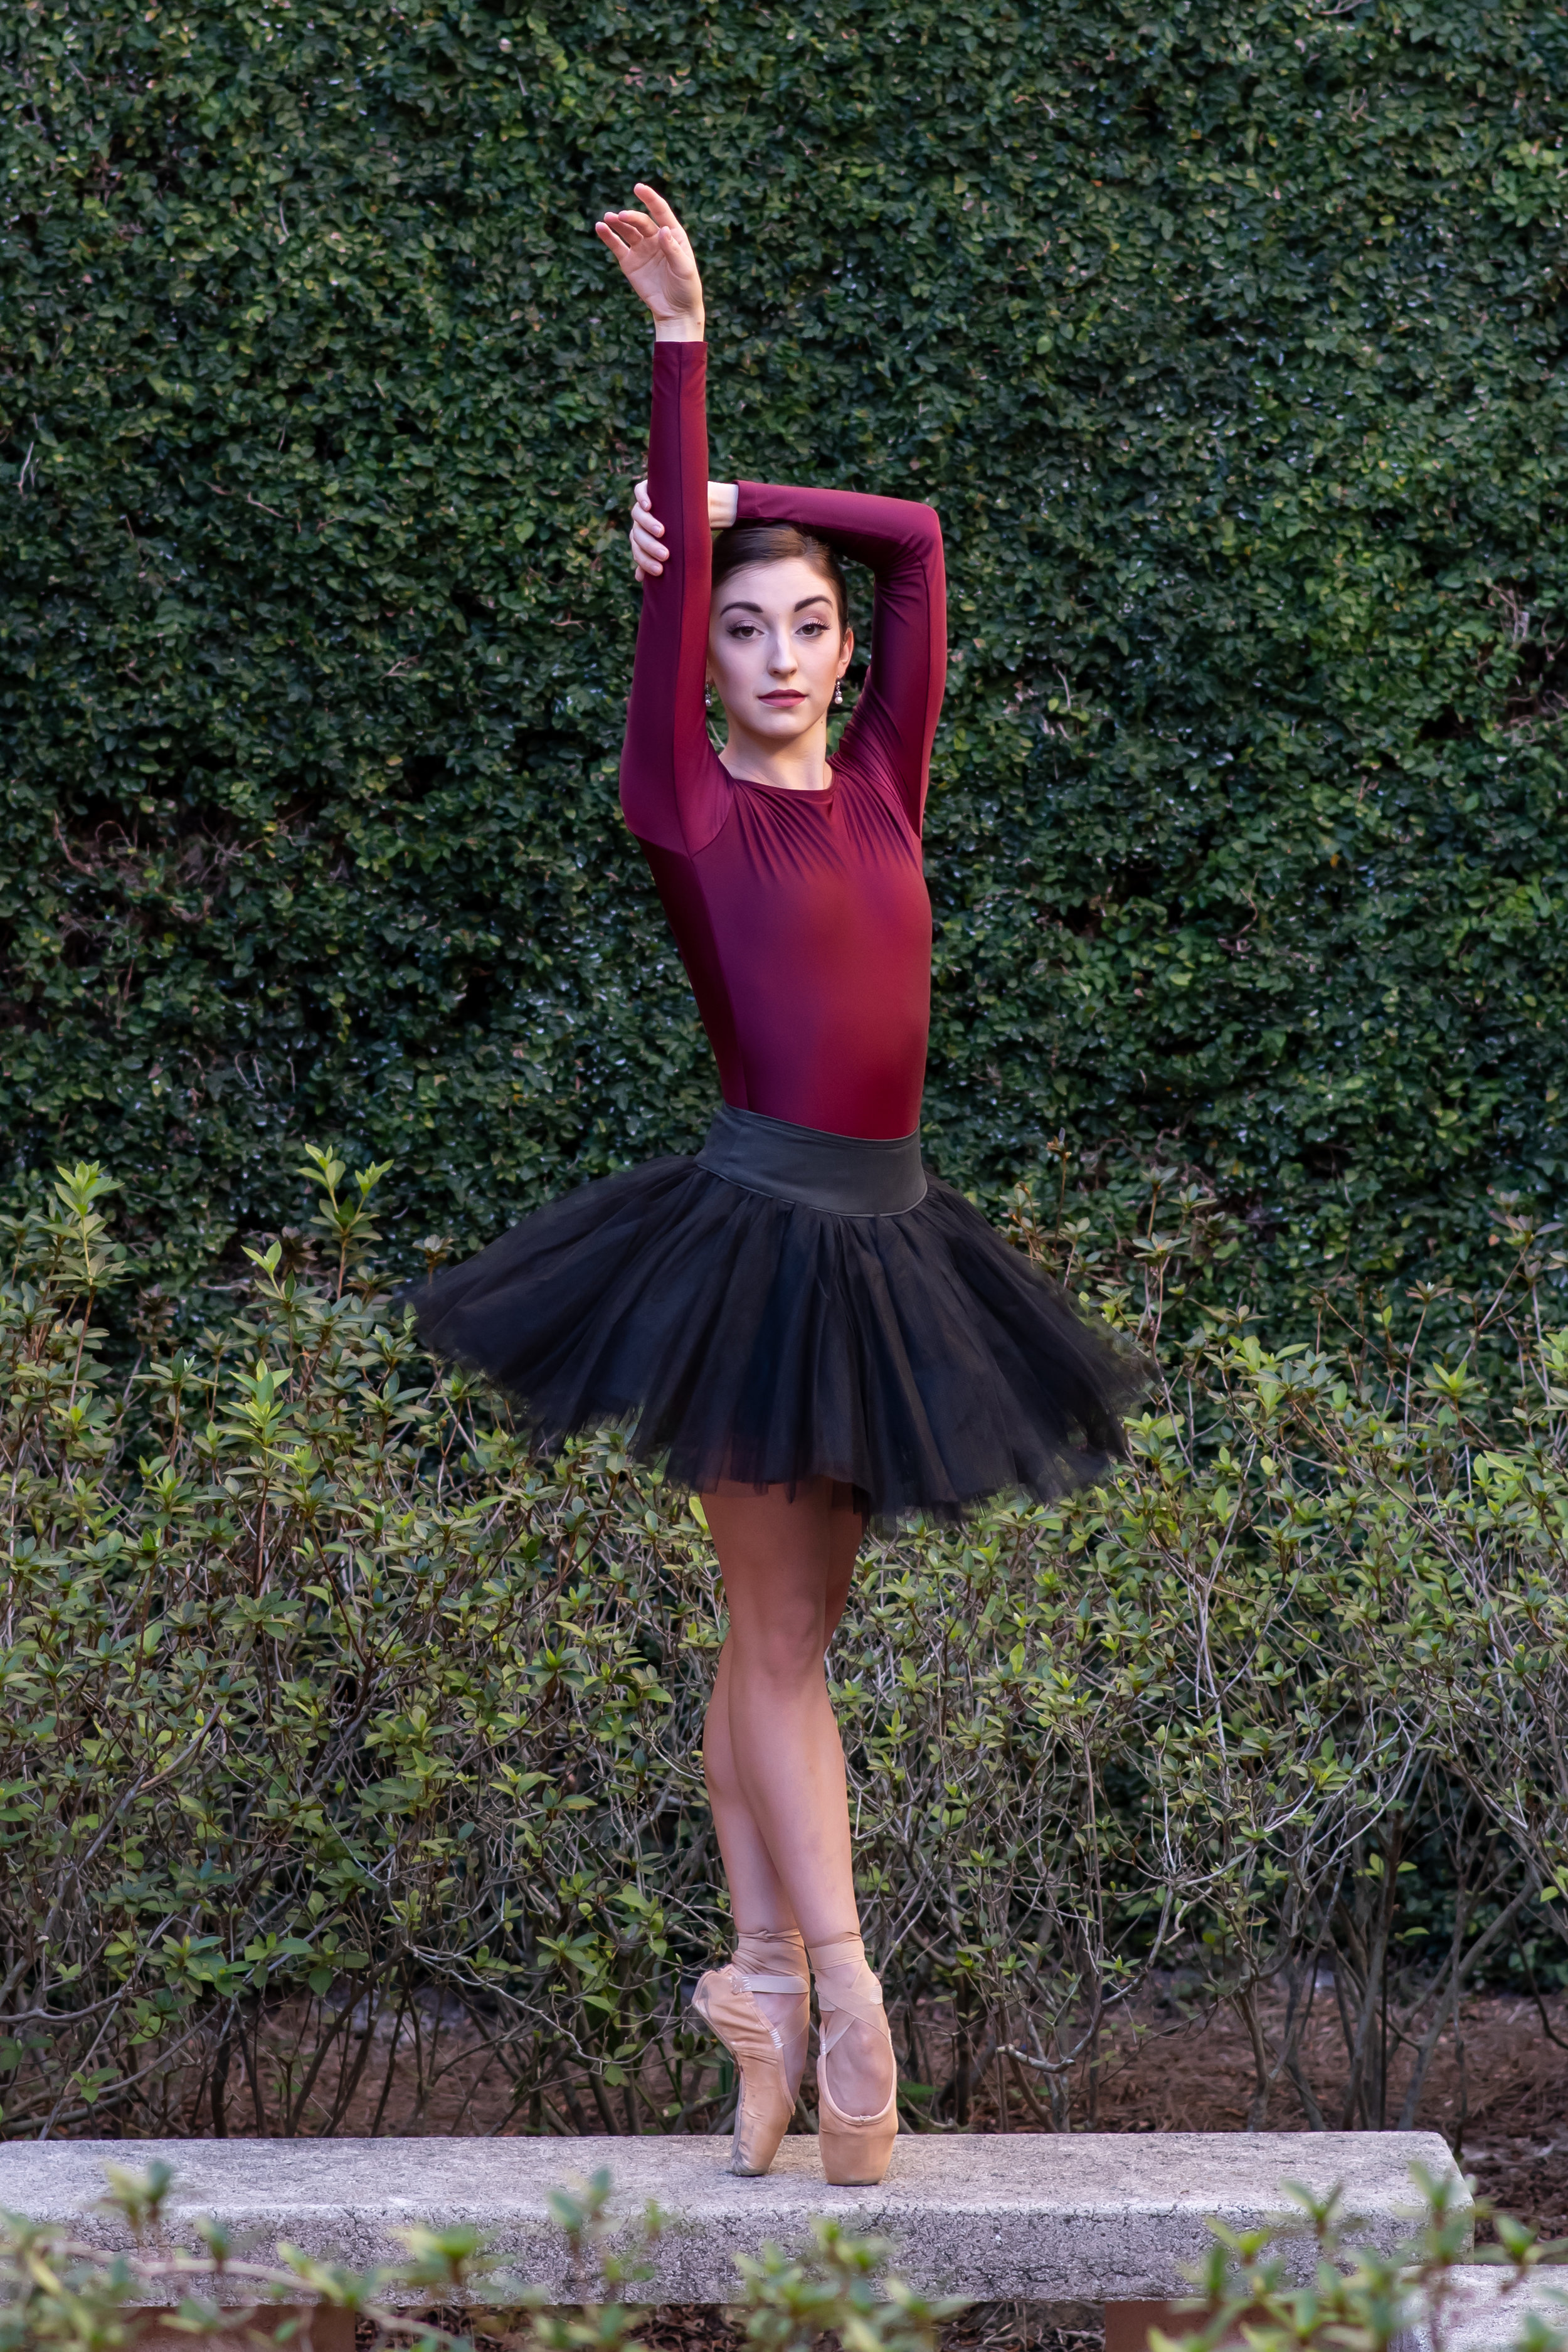 ballet-dancers-adam-boreland-izzy-mendez-portraits-rollins-college-orlando-ballet-orlando-photographer-yanitza-ninett-7.jpg